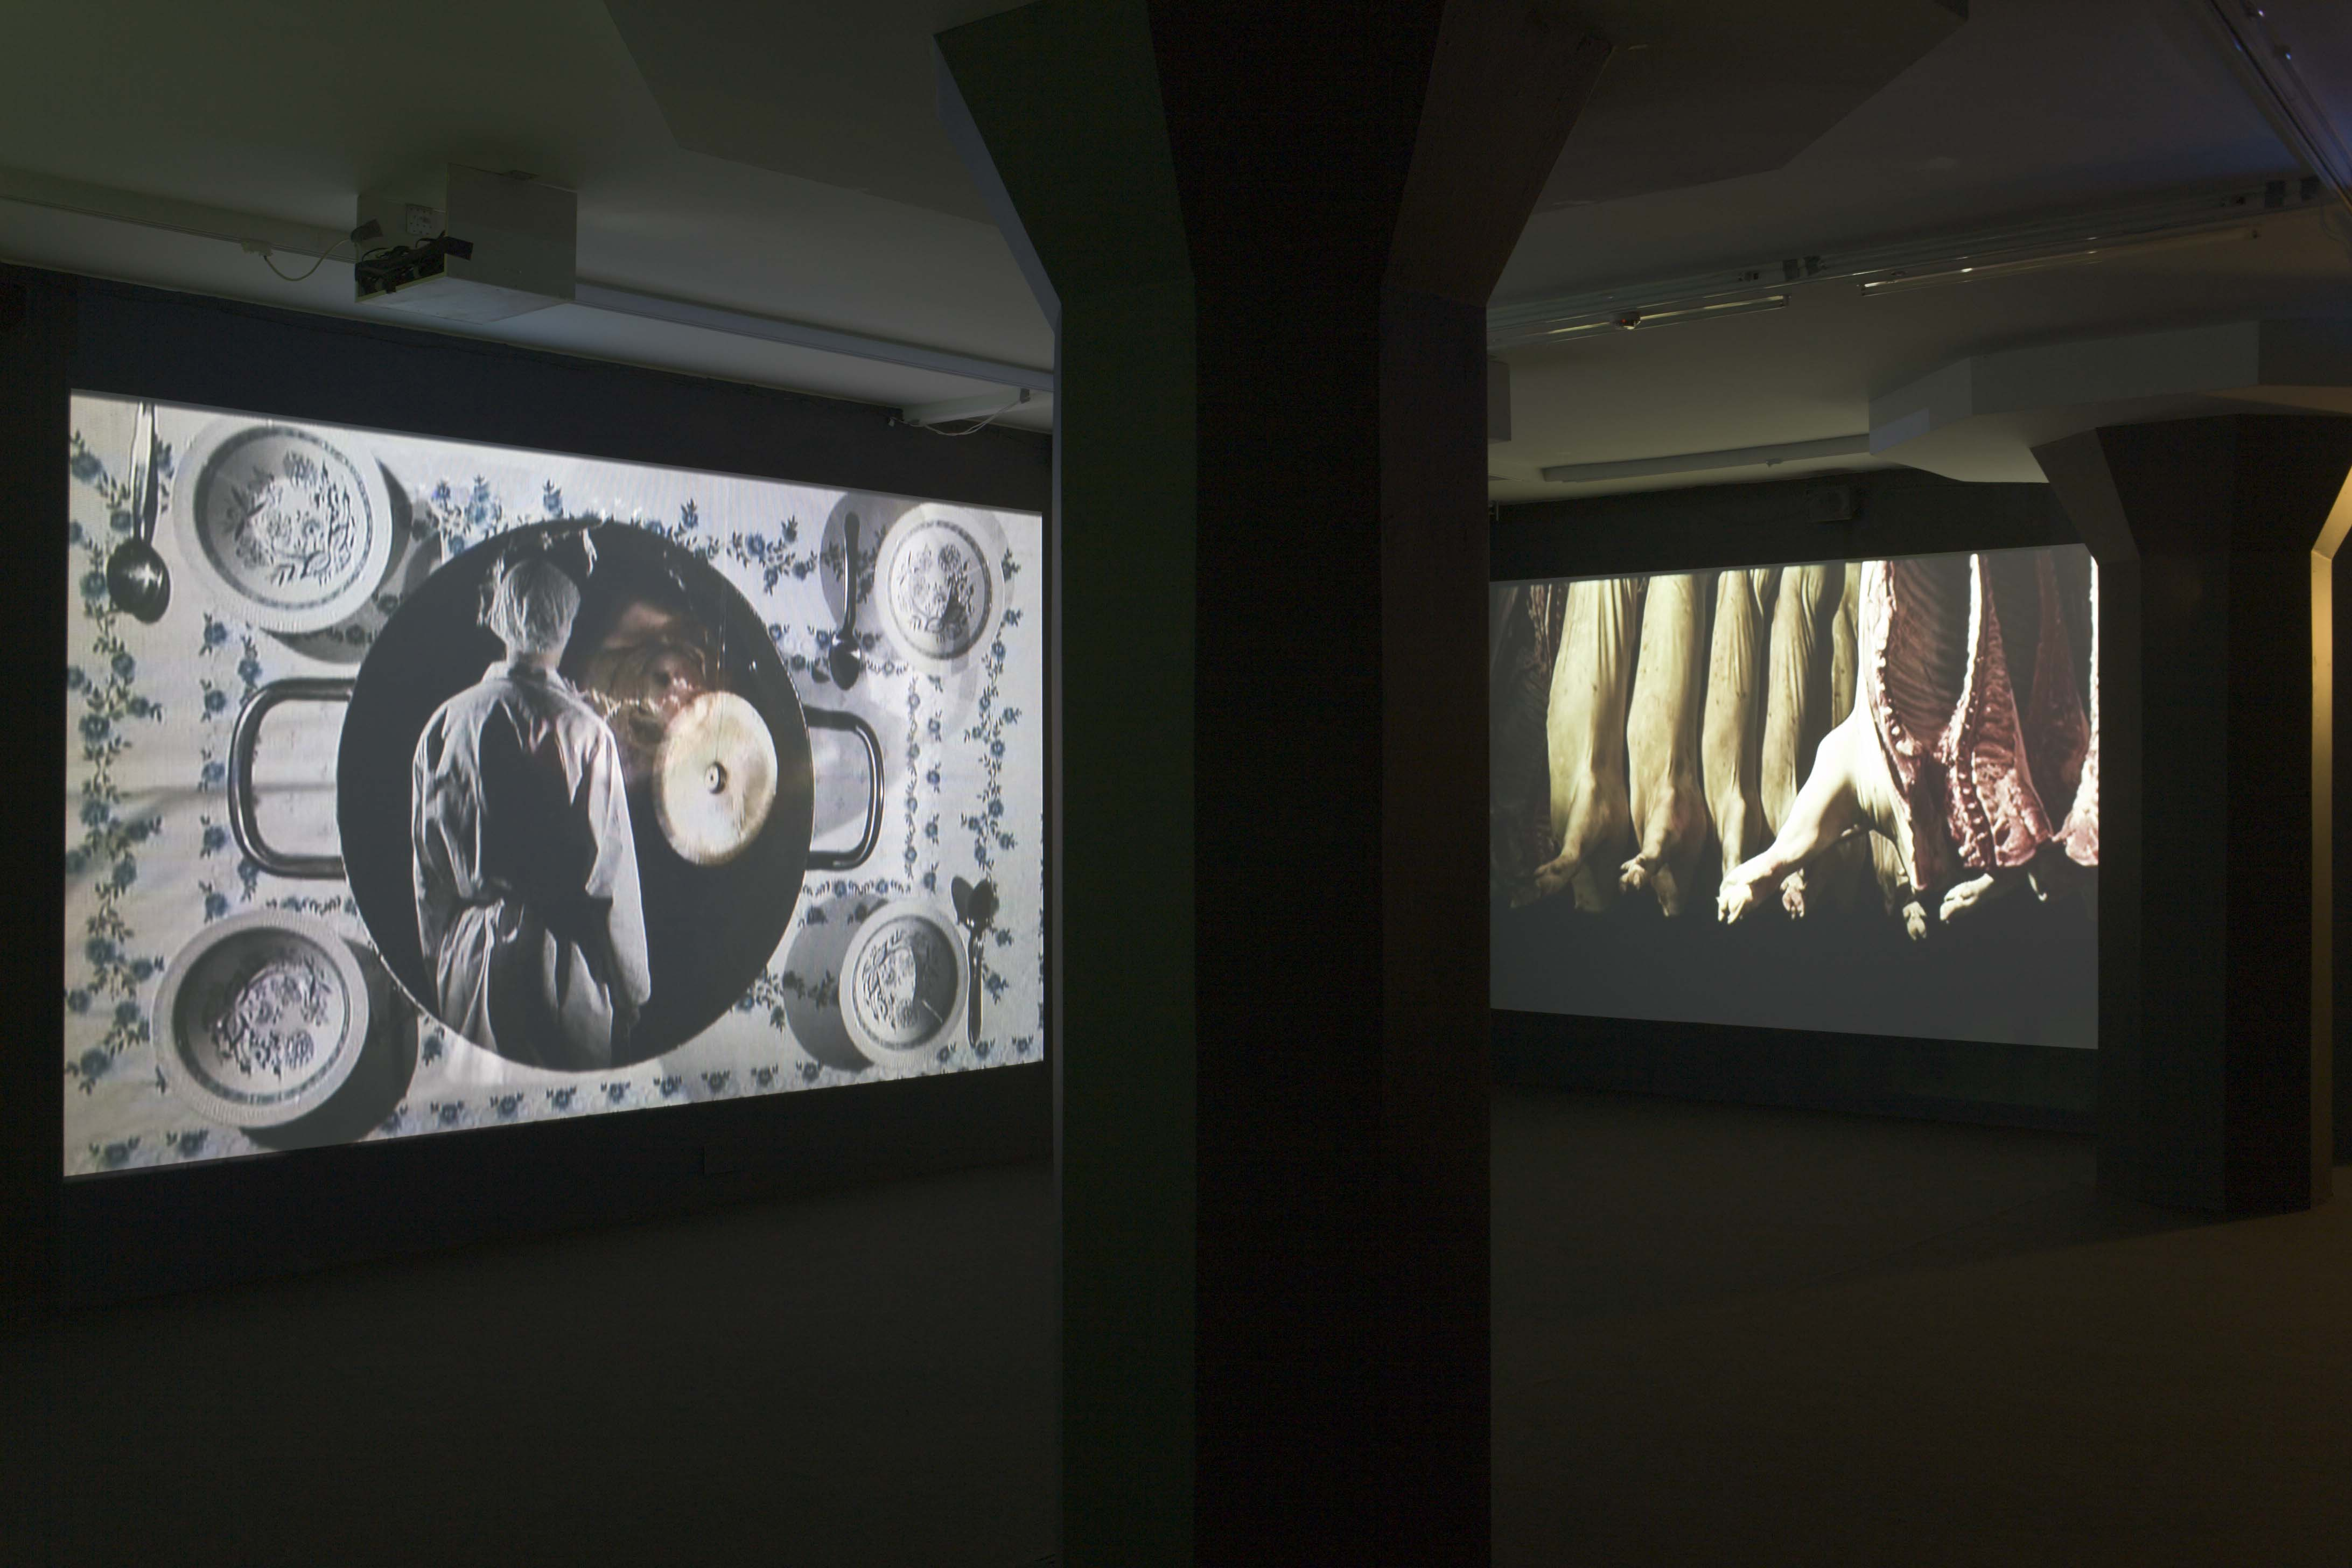 sigurdur gudjonsson_Breed_Reykjavík Art Museum 4